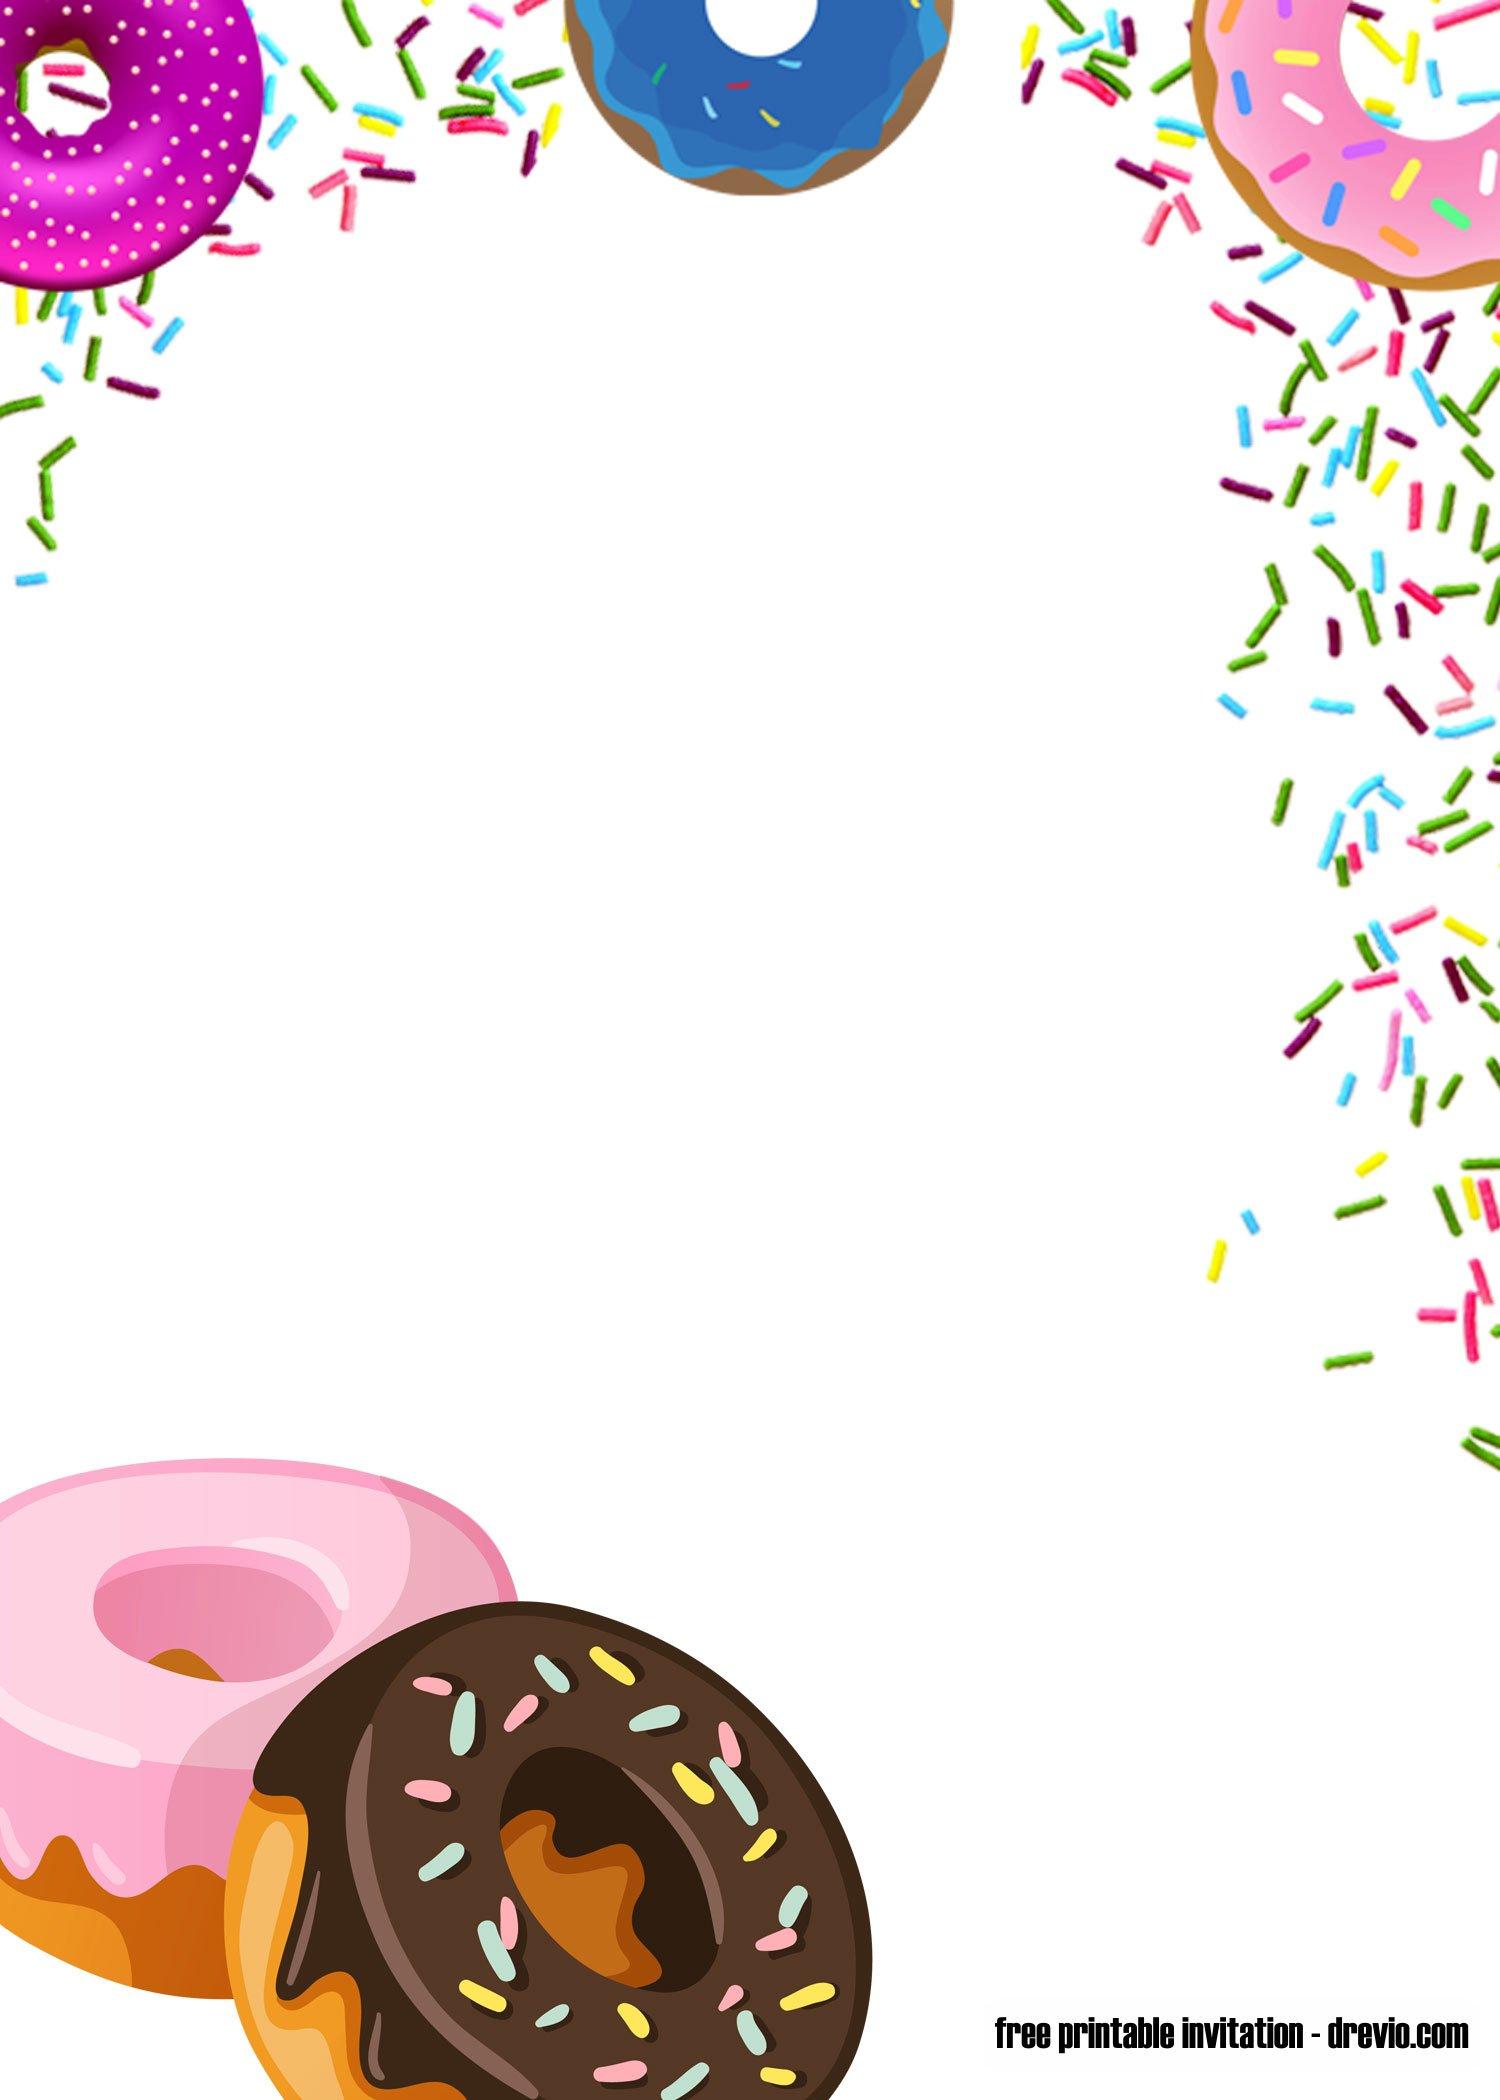 Free Printable Donuts And Pajamas Invitation Templates